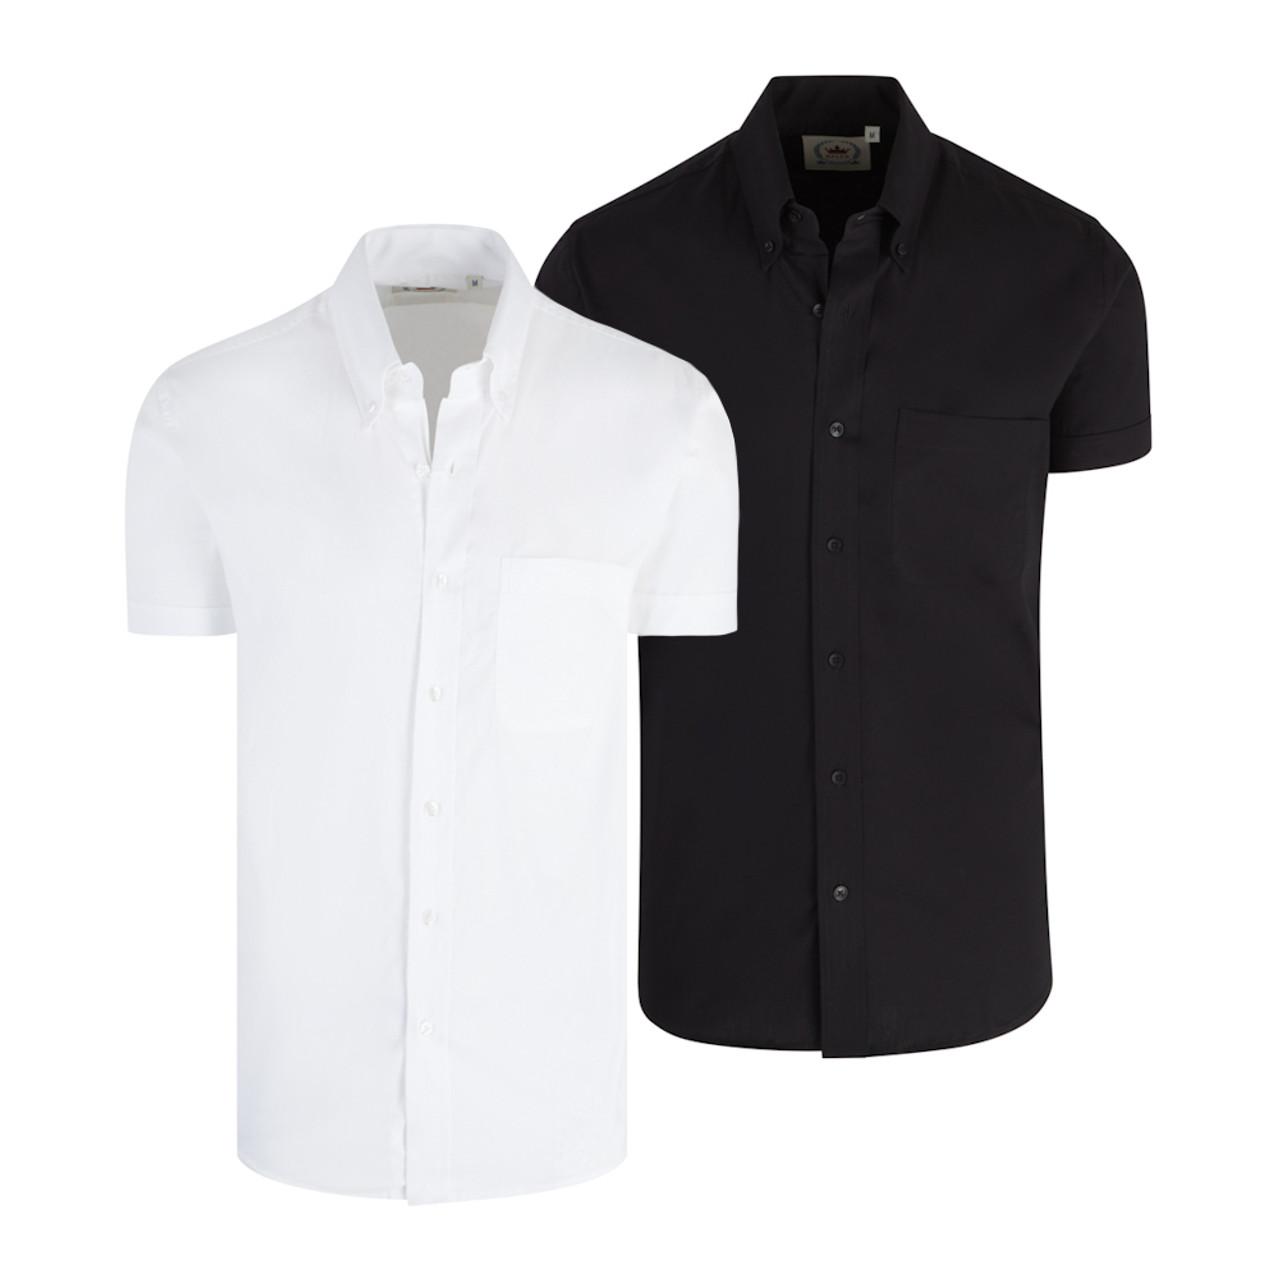 Mens Relco Oxford Short Sleeve Button Down Mod Shirt